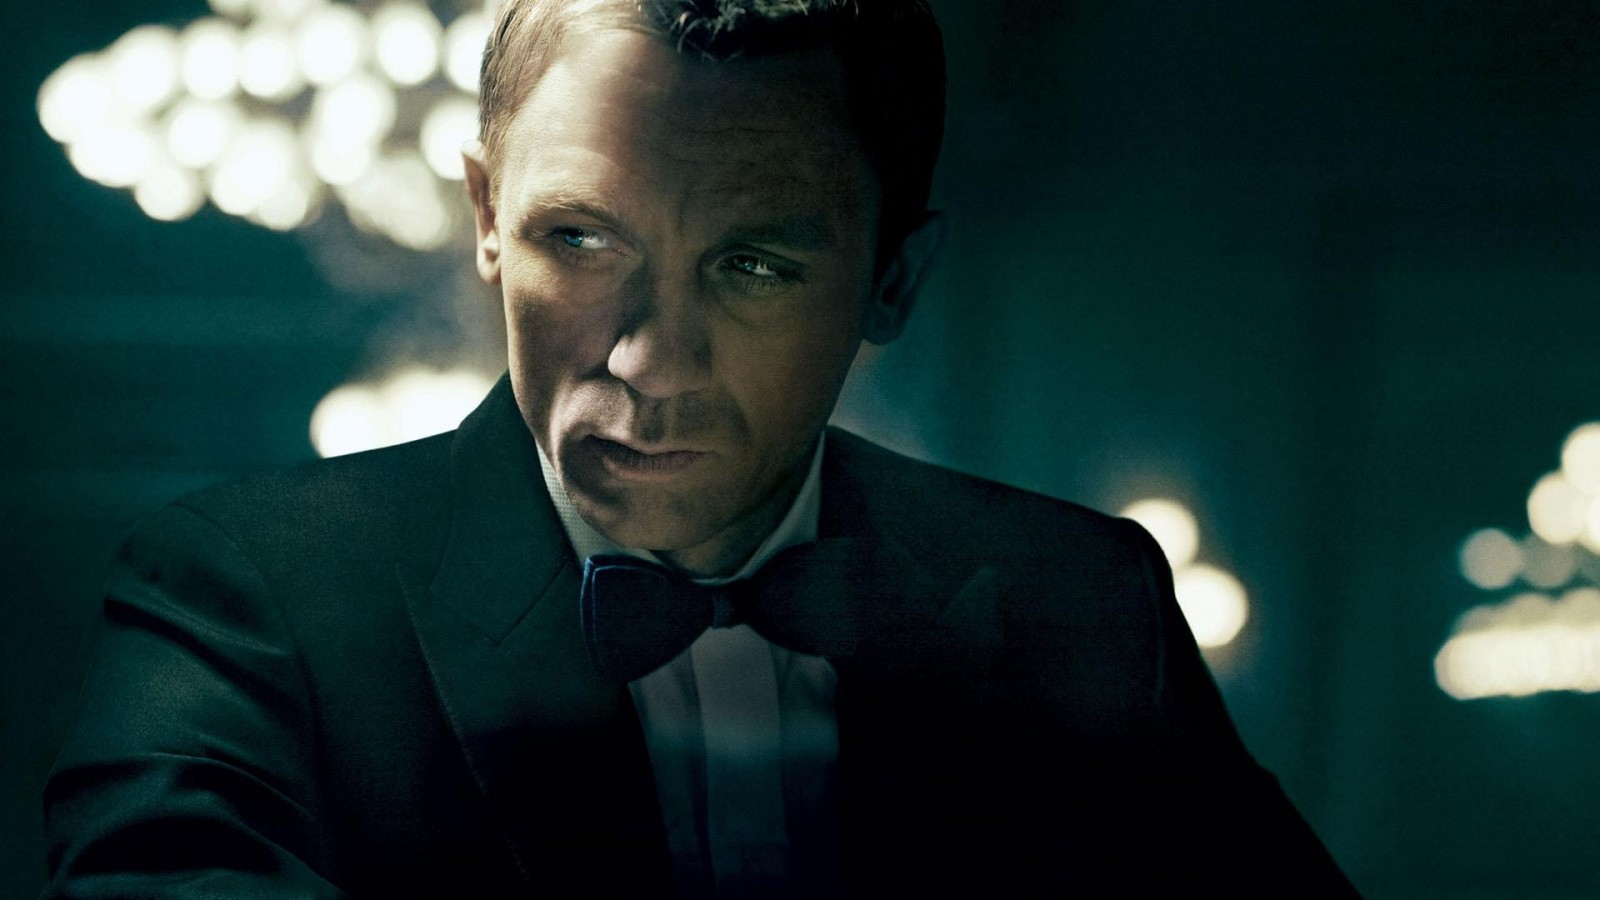 movies_James_Bond_Casino_Royale_Daniel_Craig-230090 (1).jpg